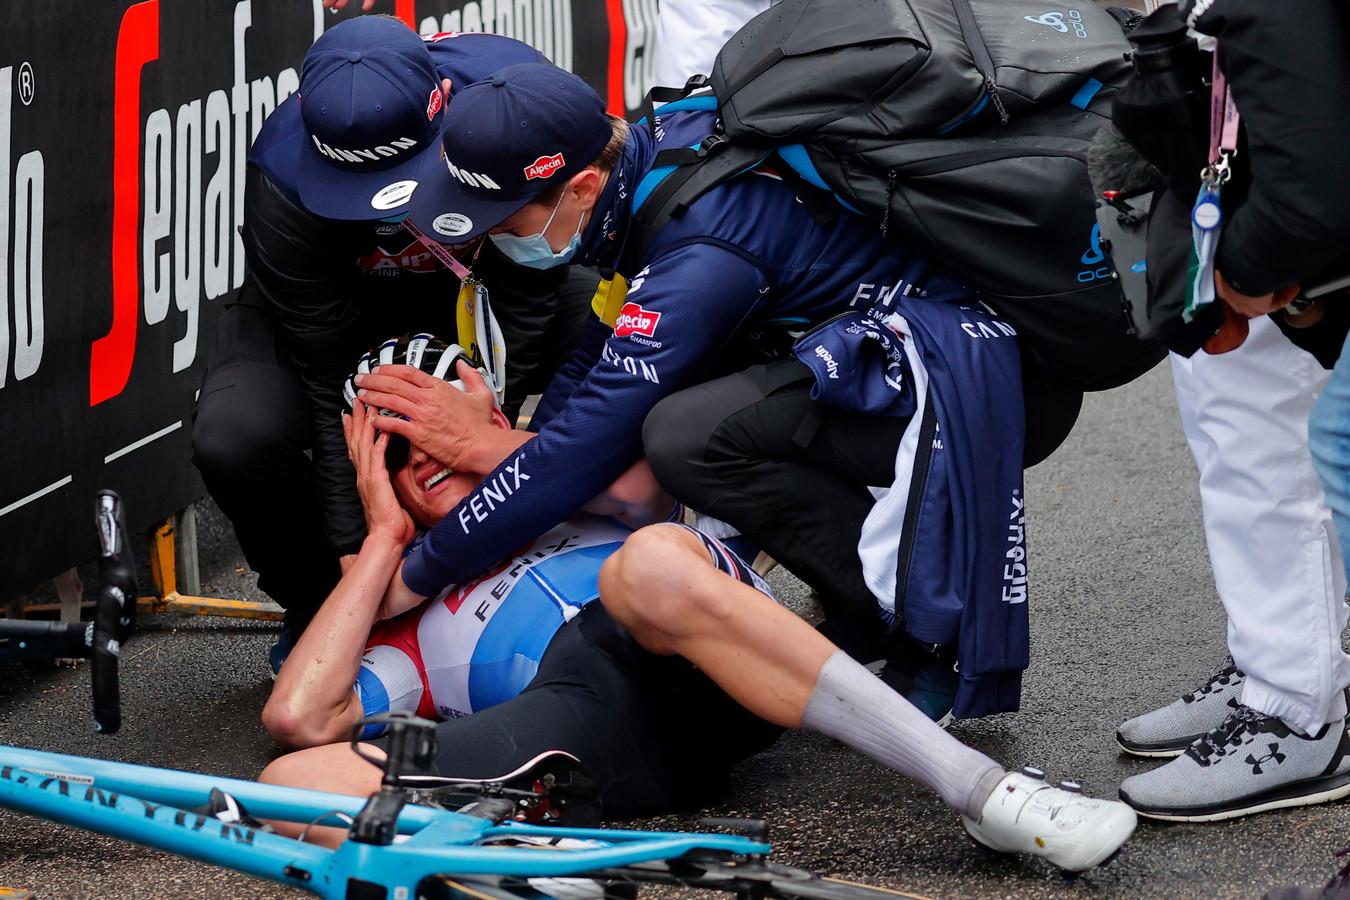 Mathieu van der Poel na zijn gewonnen etappe in de Tirreno-Adriatico.